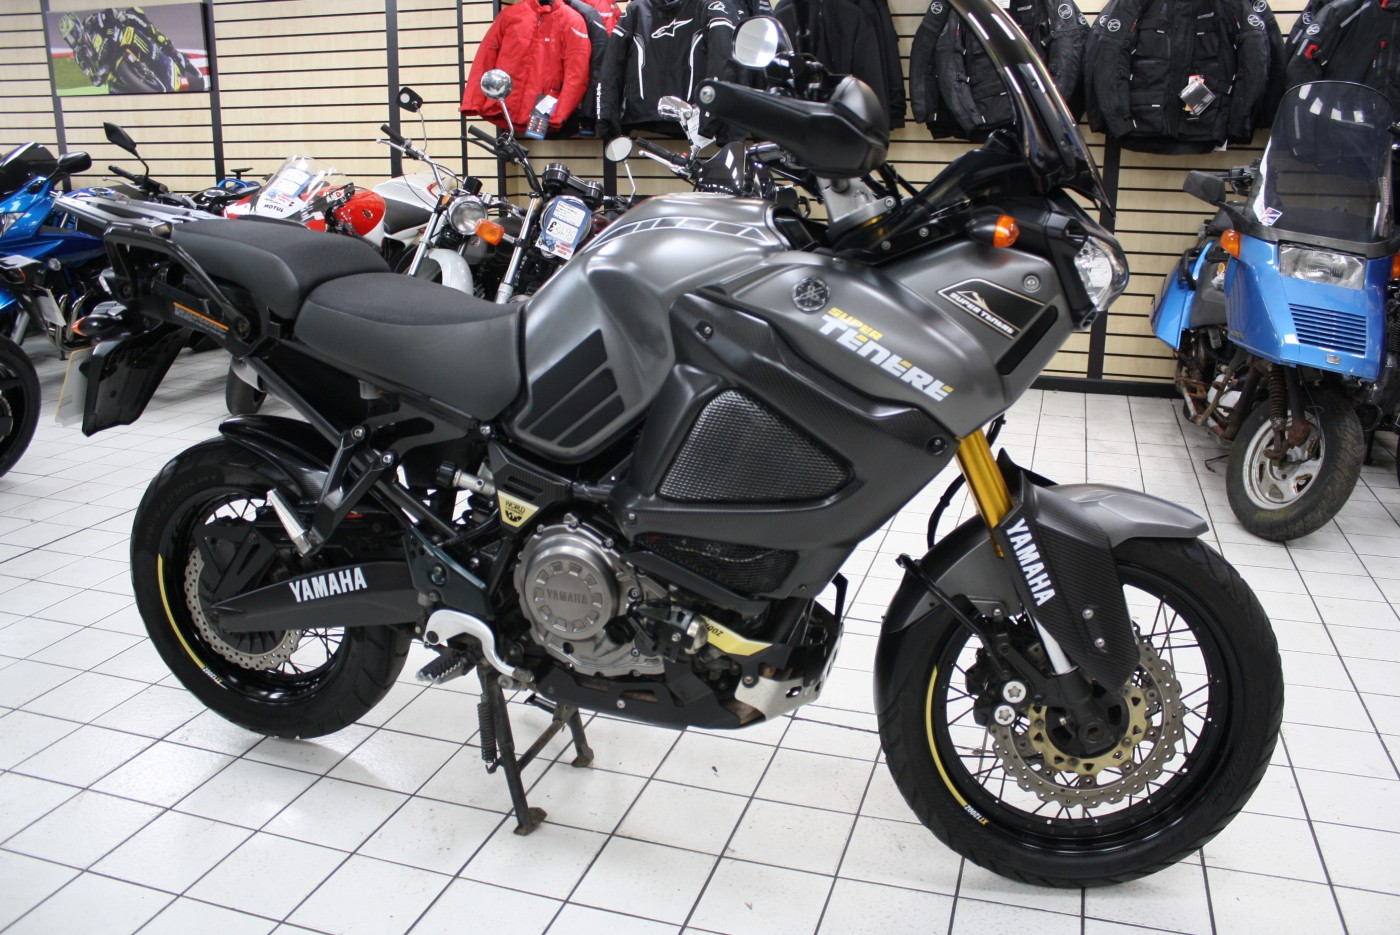 2013 Yamaha XT 1200 Z Super Tenere World Crosser